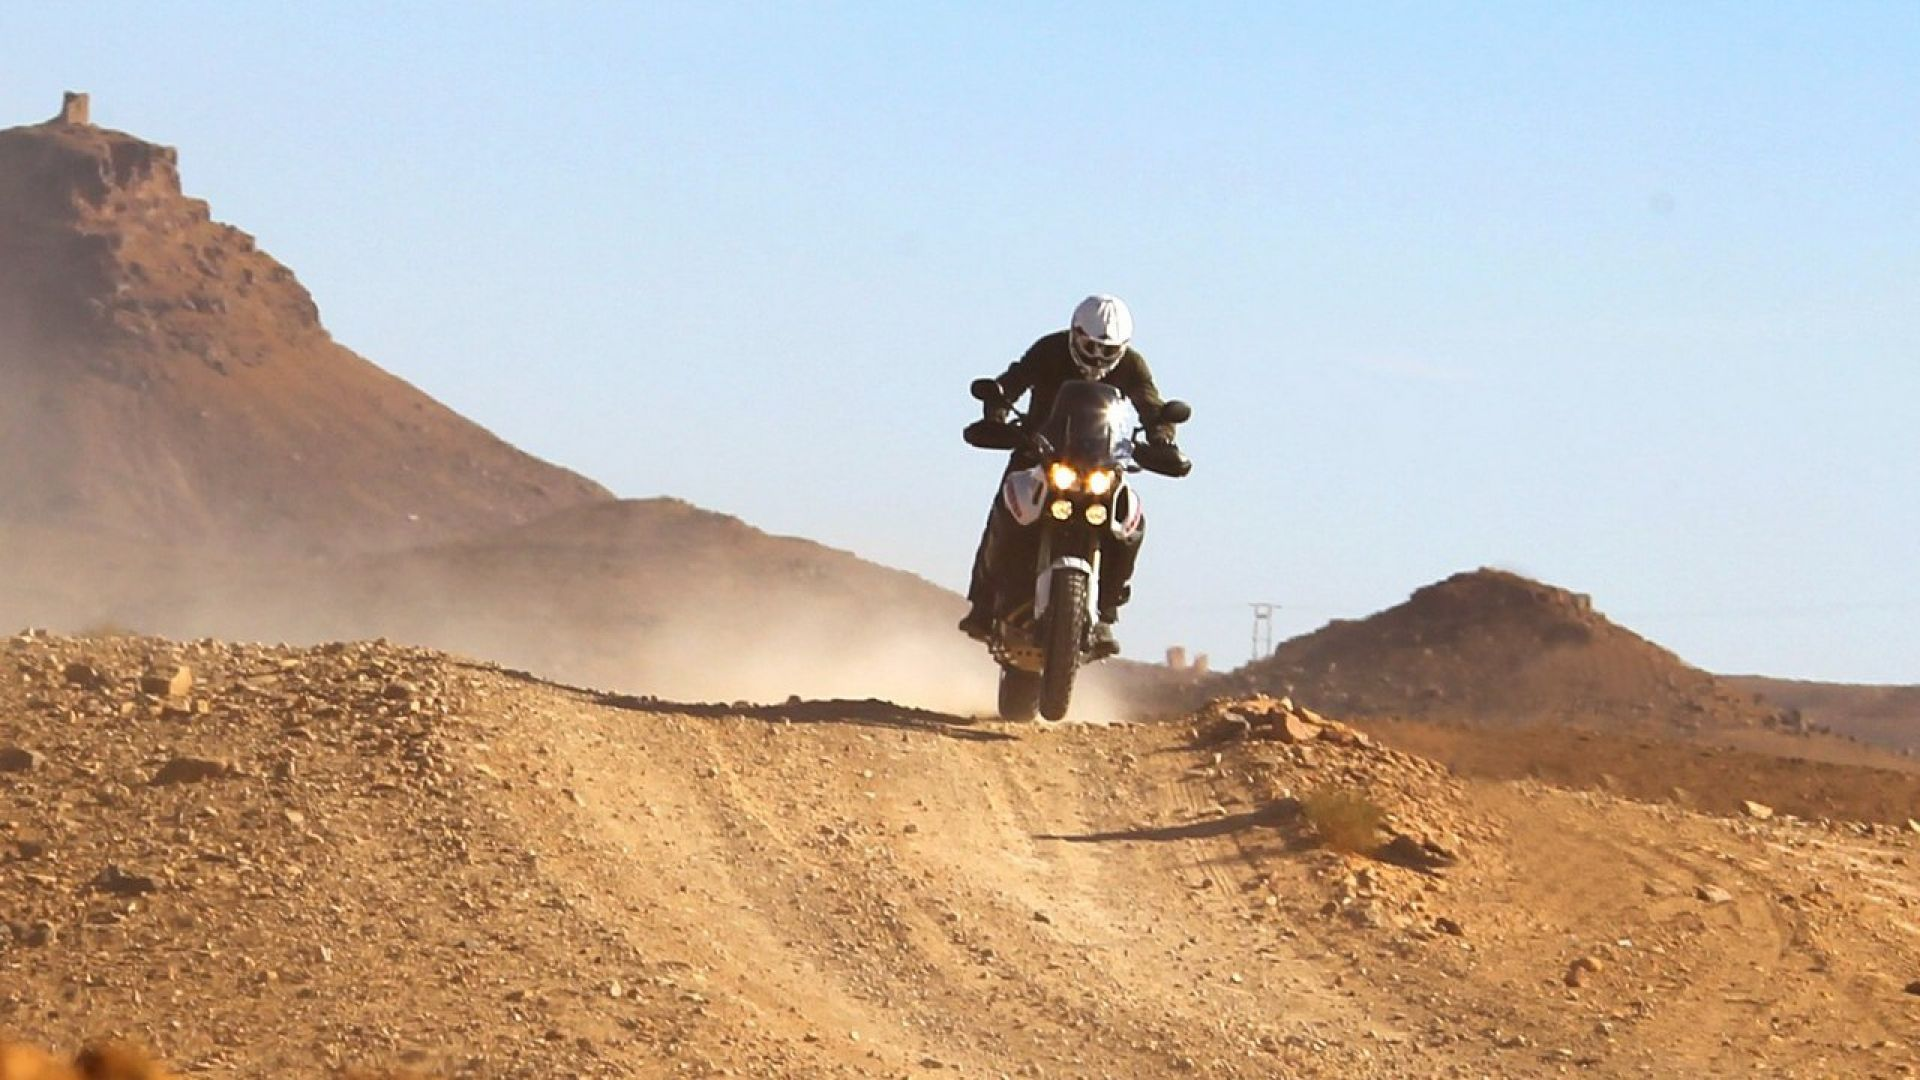 Immagine 107: In Marocco con la Yamaha Super Ténéré